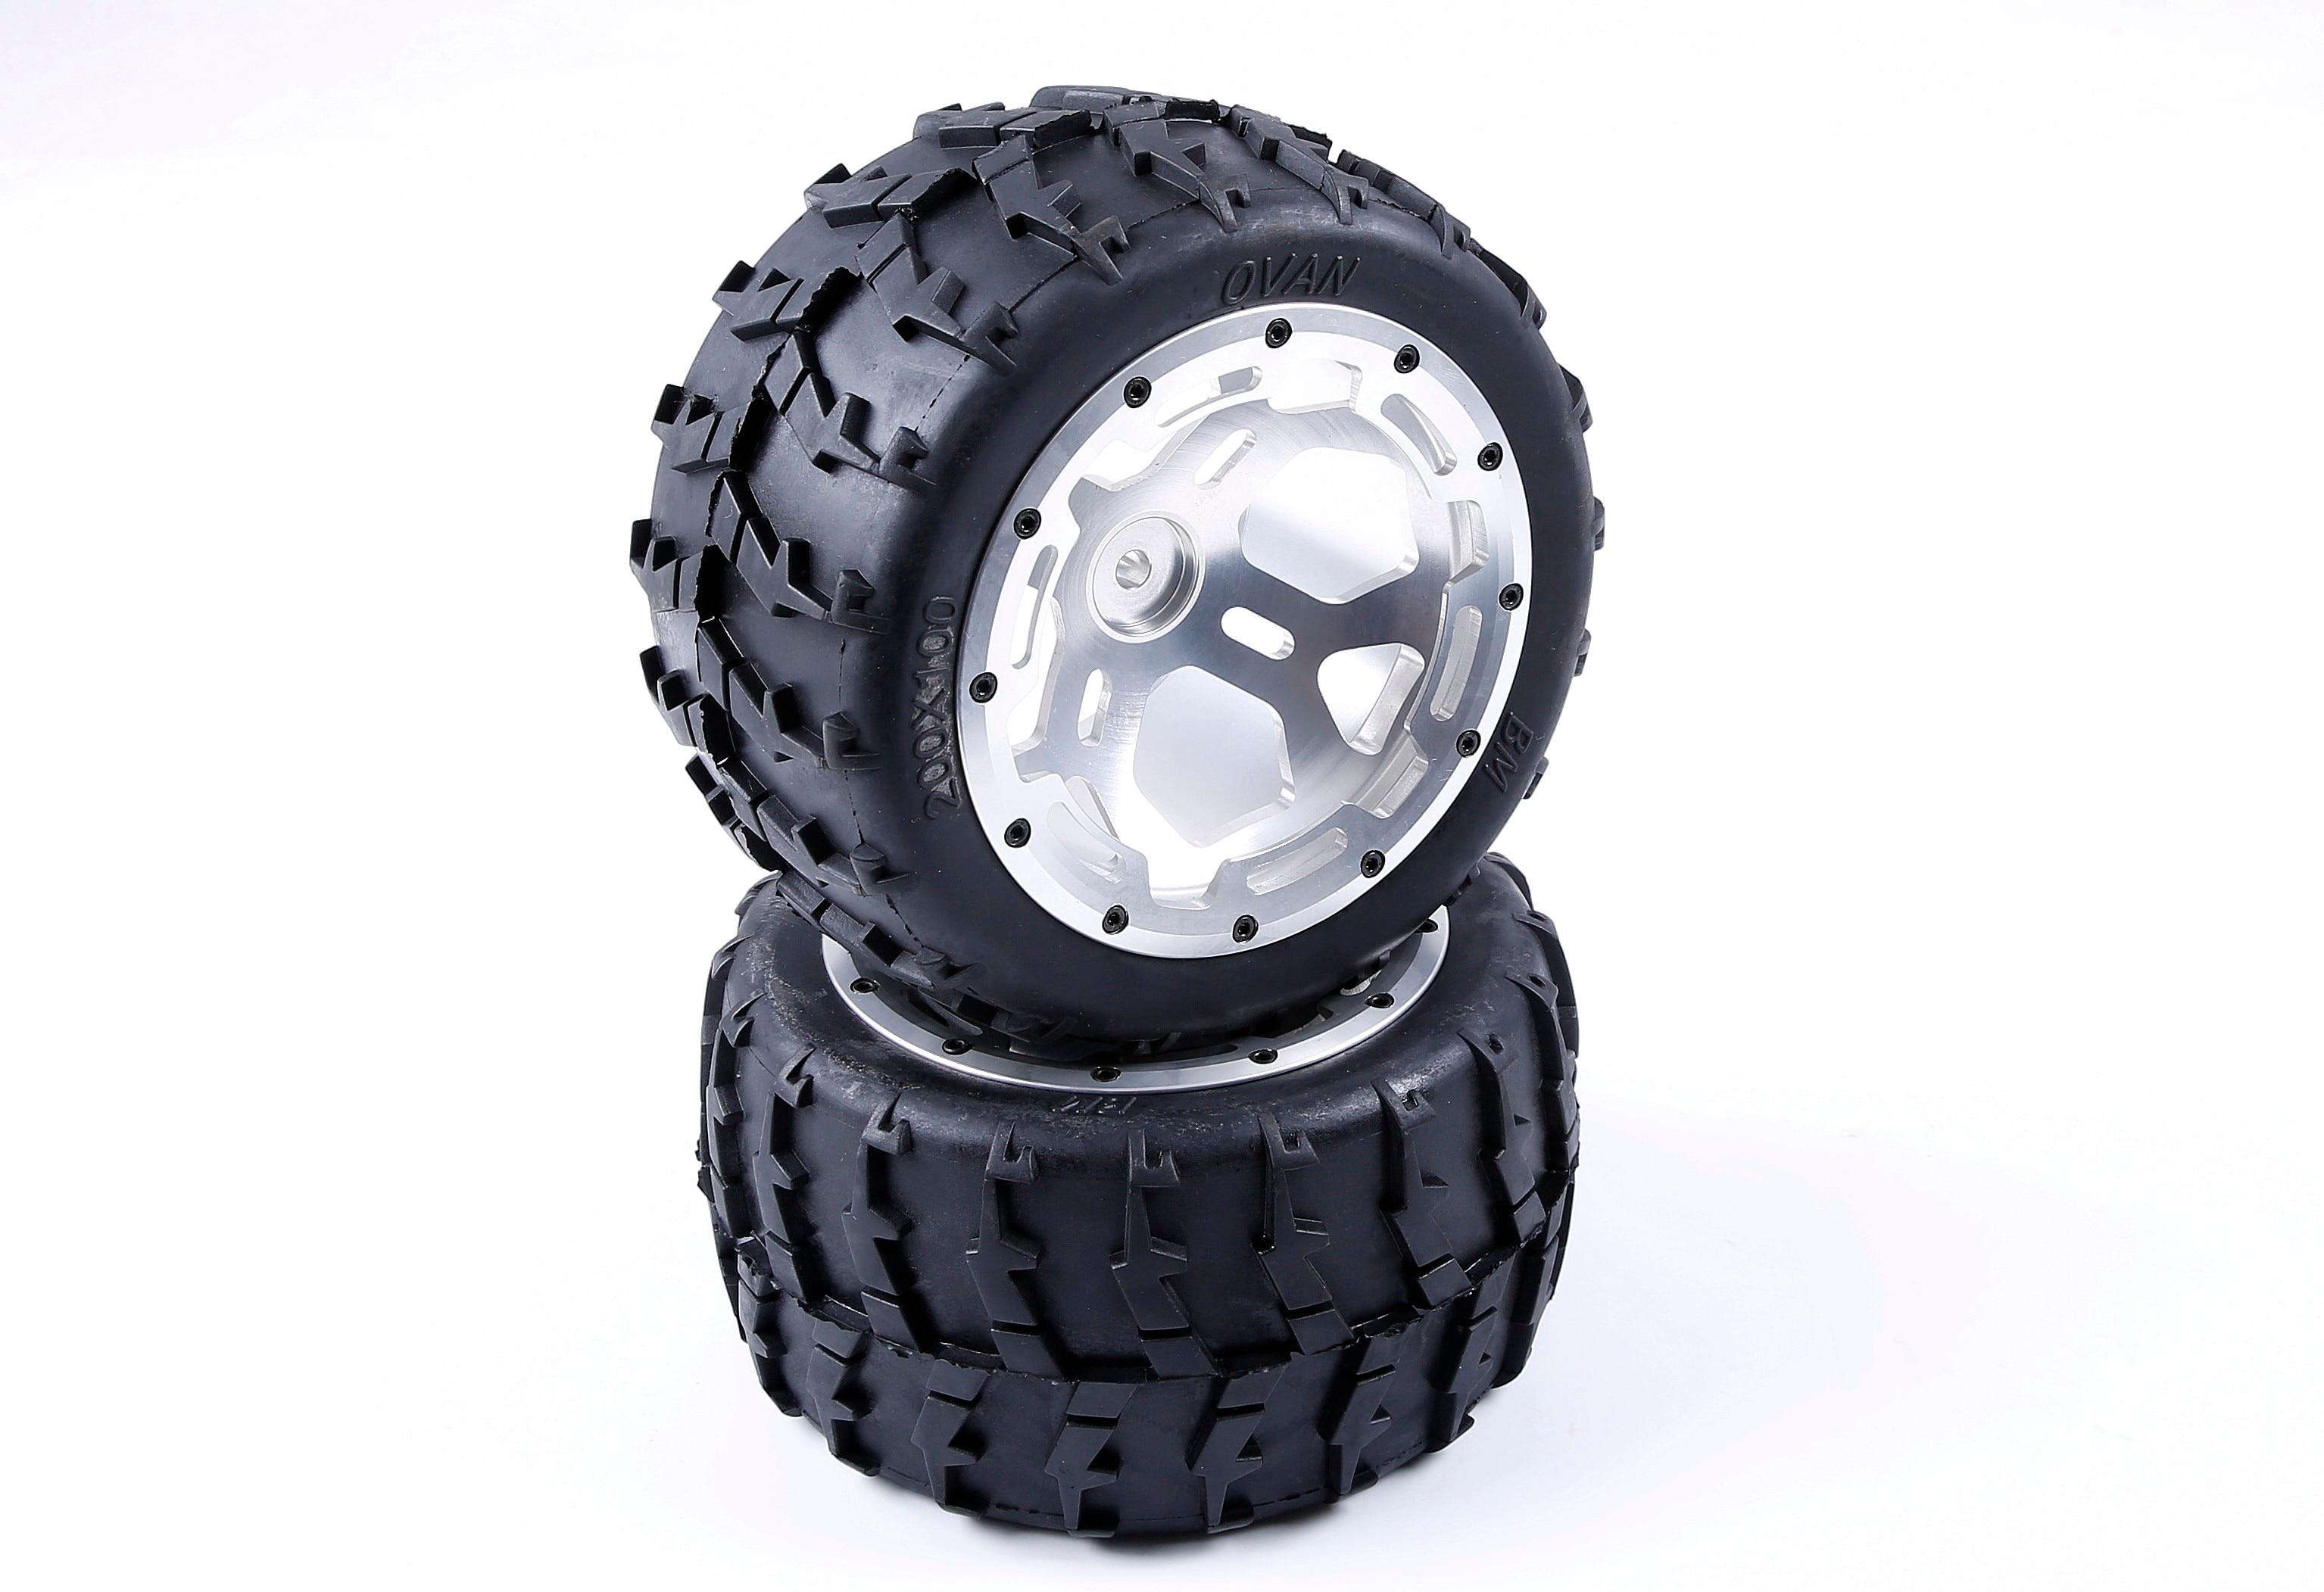 Набор металлических колес с ЧПУ для 1/5 FG Rovan BM Monster Truck RC автозапчасти